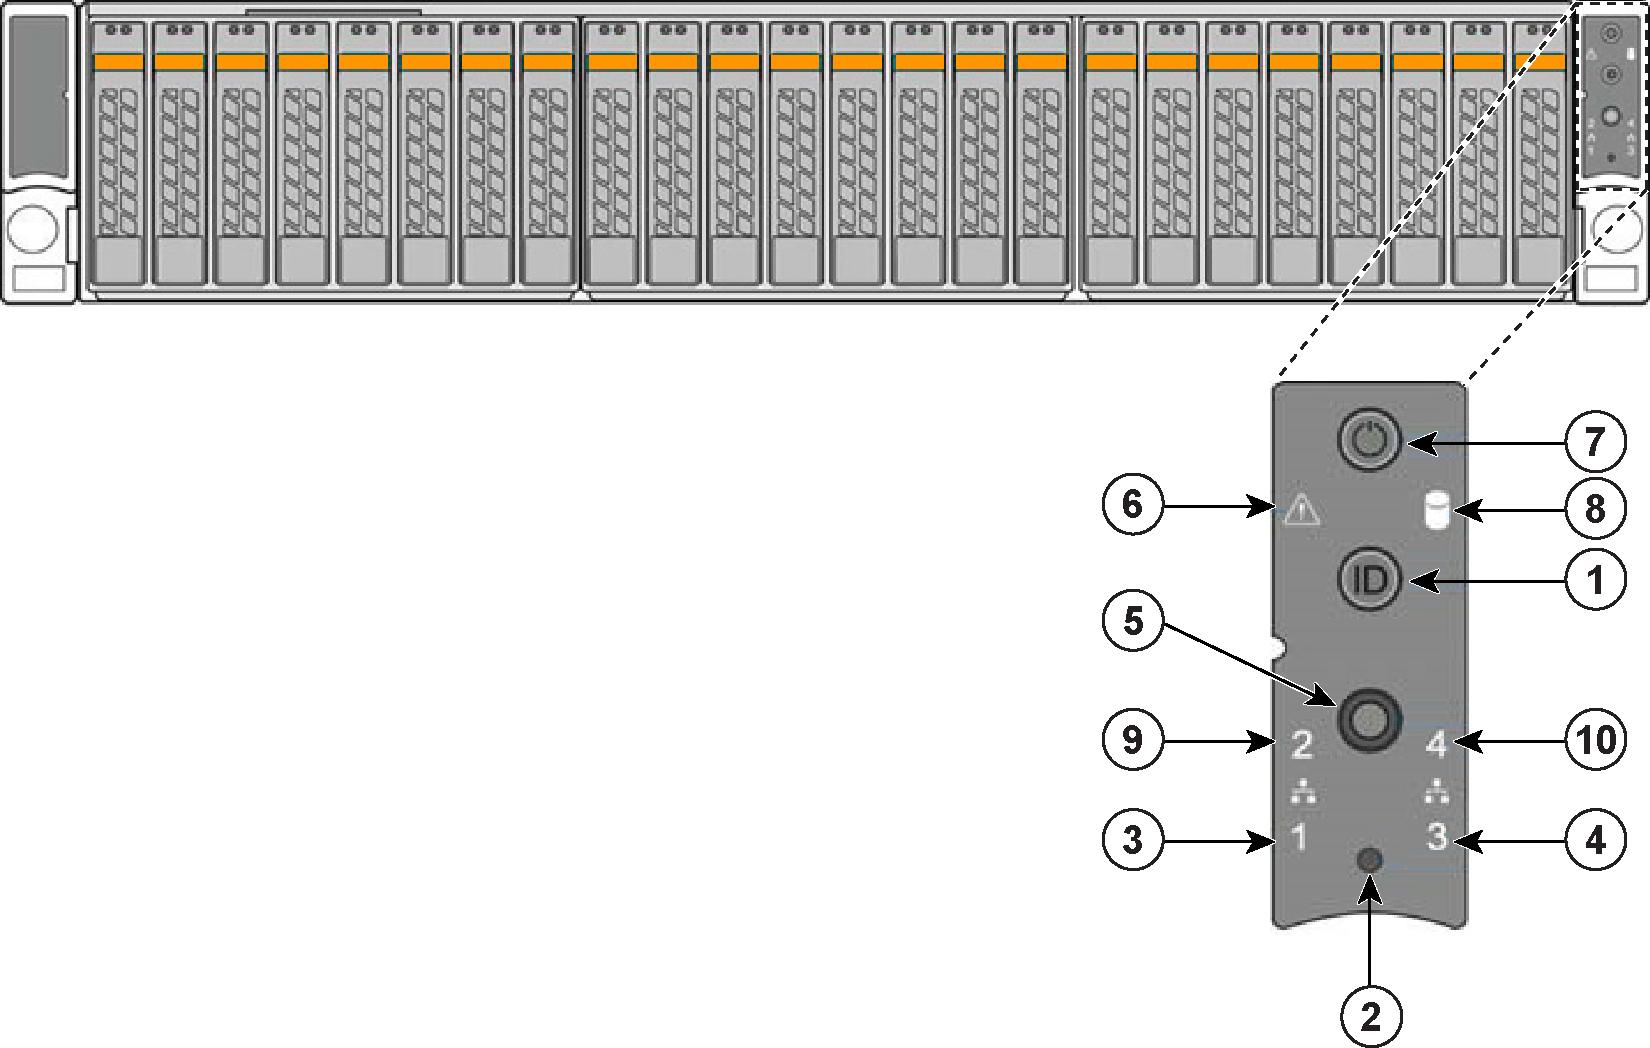 Steelhead Cx Xx70 Appliance Specifications